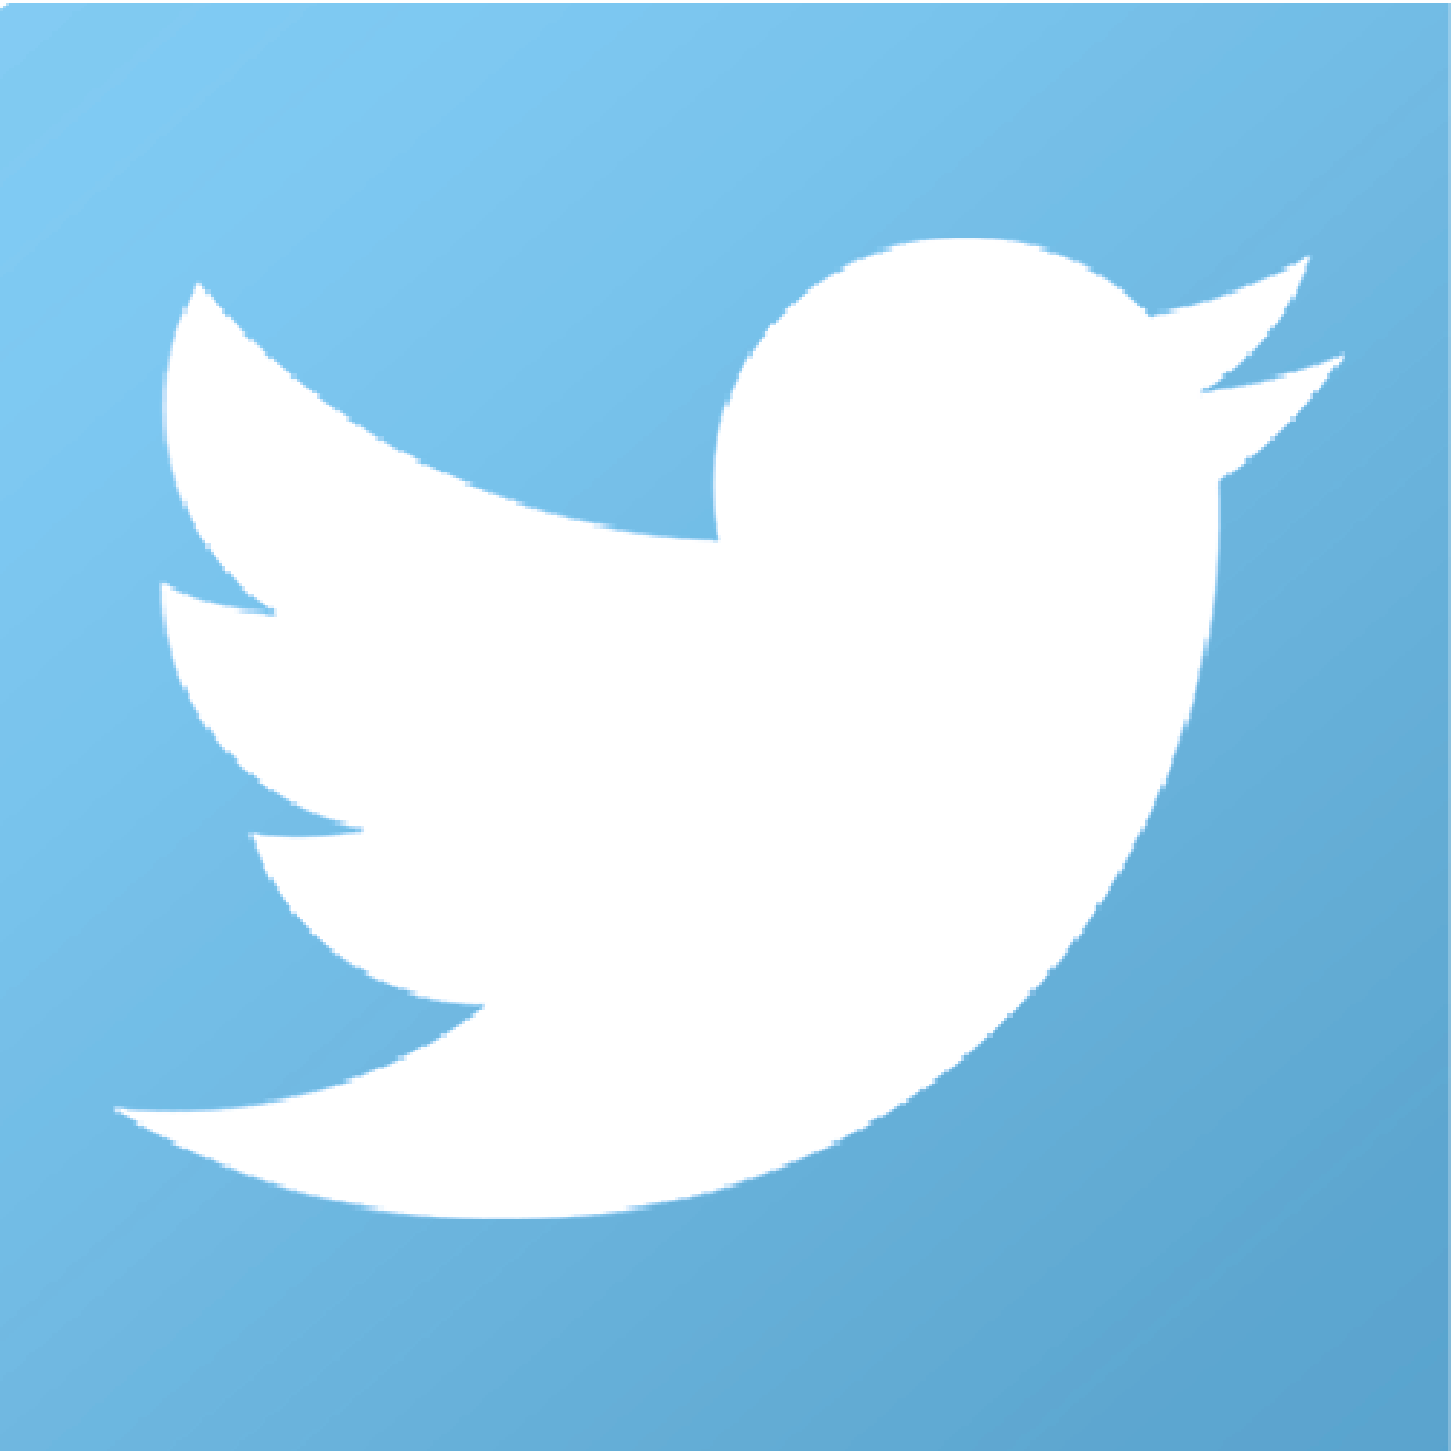 Son twitter